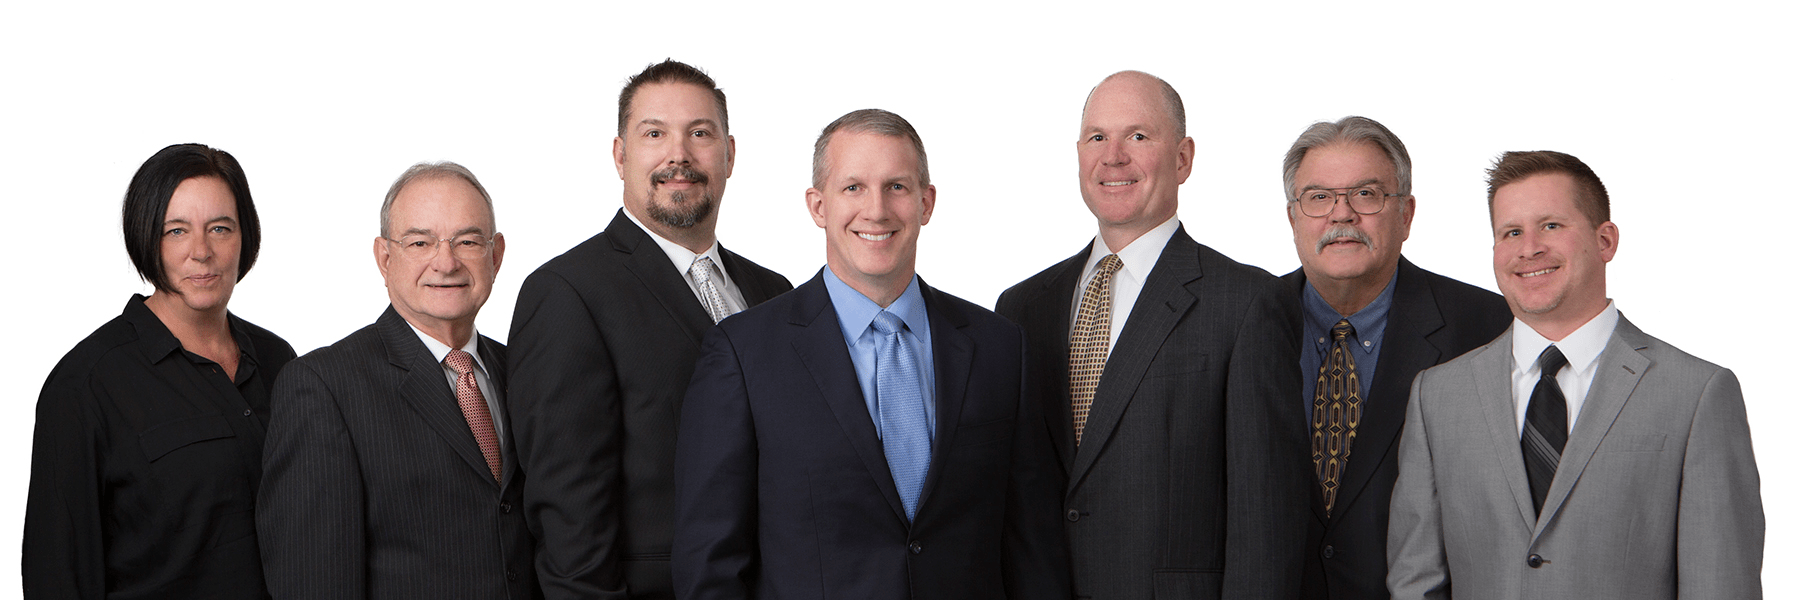 Results Business Advisors Team